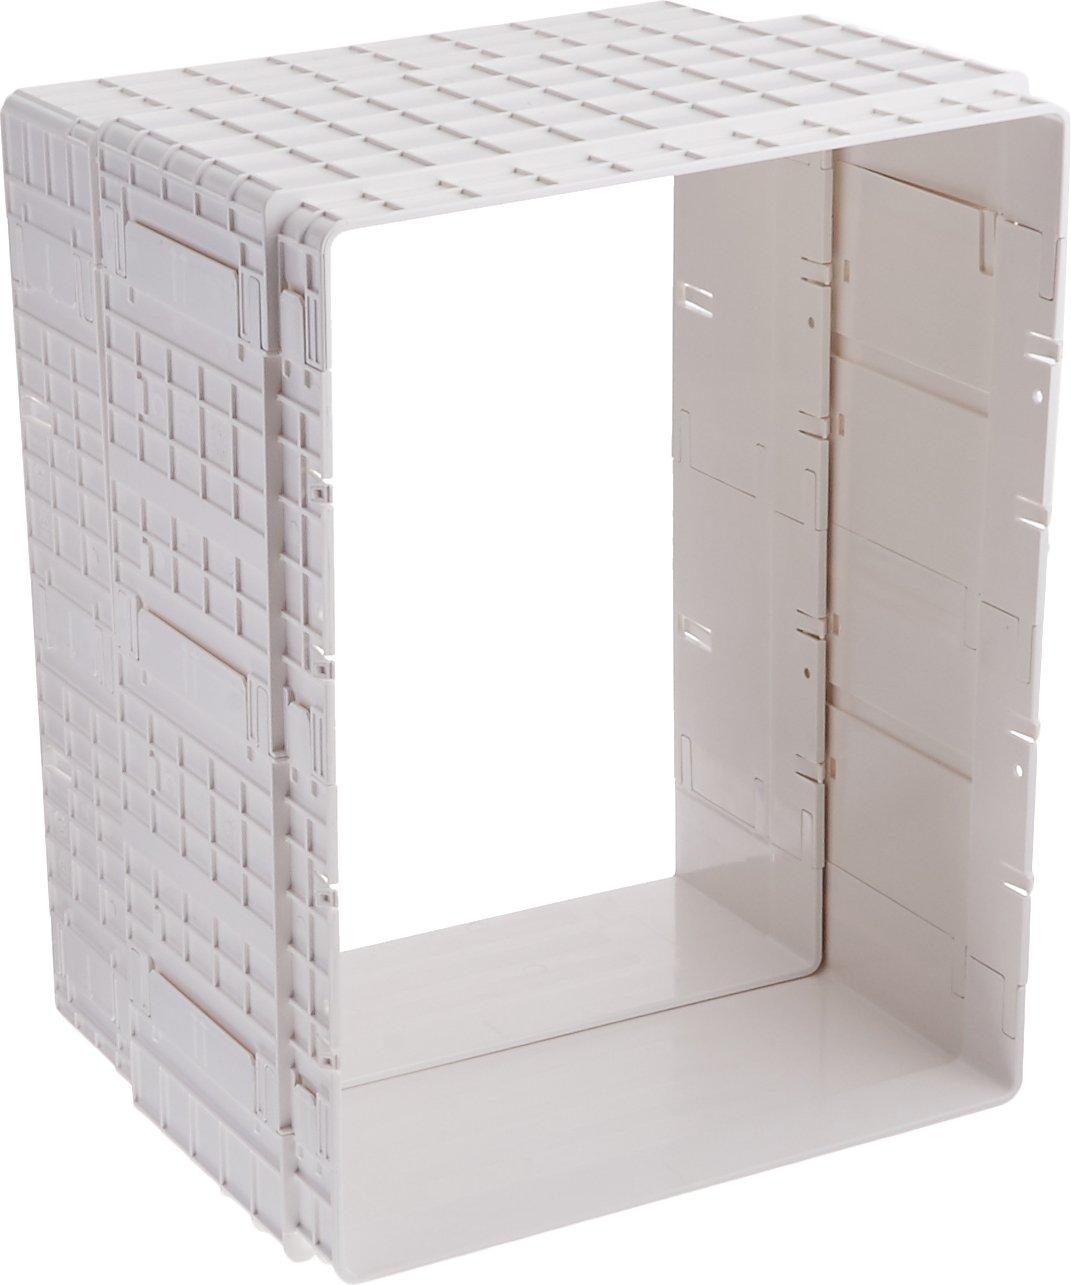 PetSafe SmartDoor Plus Wall Entry Kit, Medium